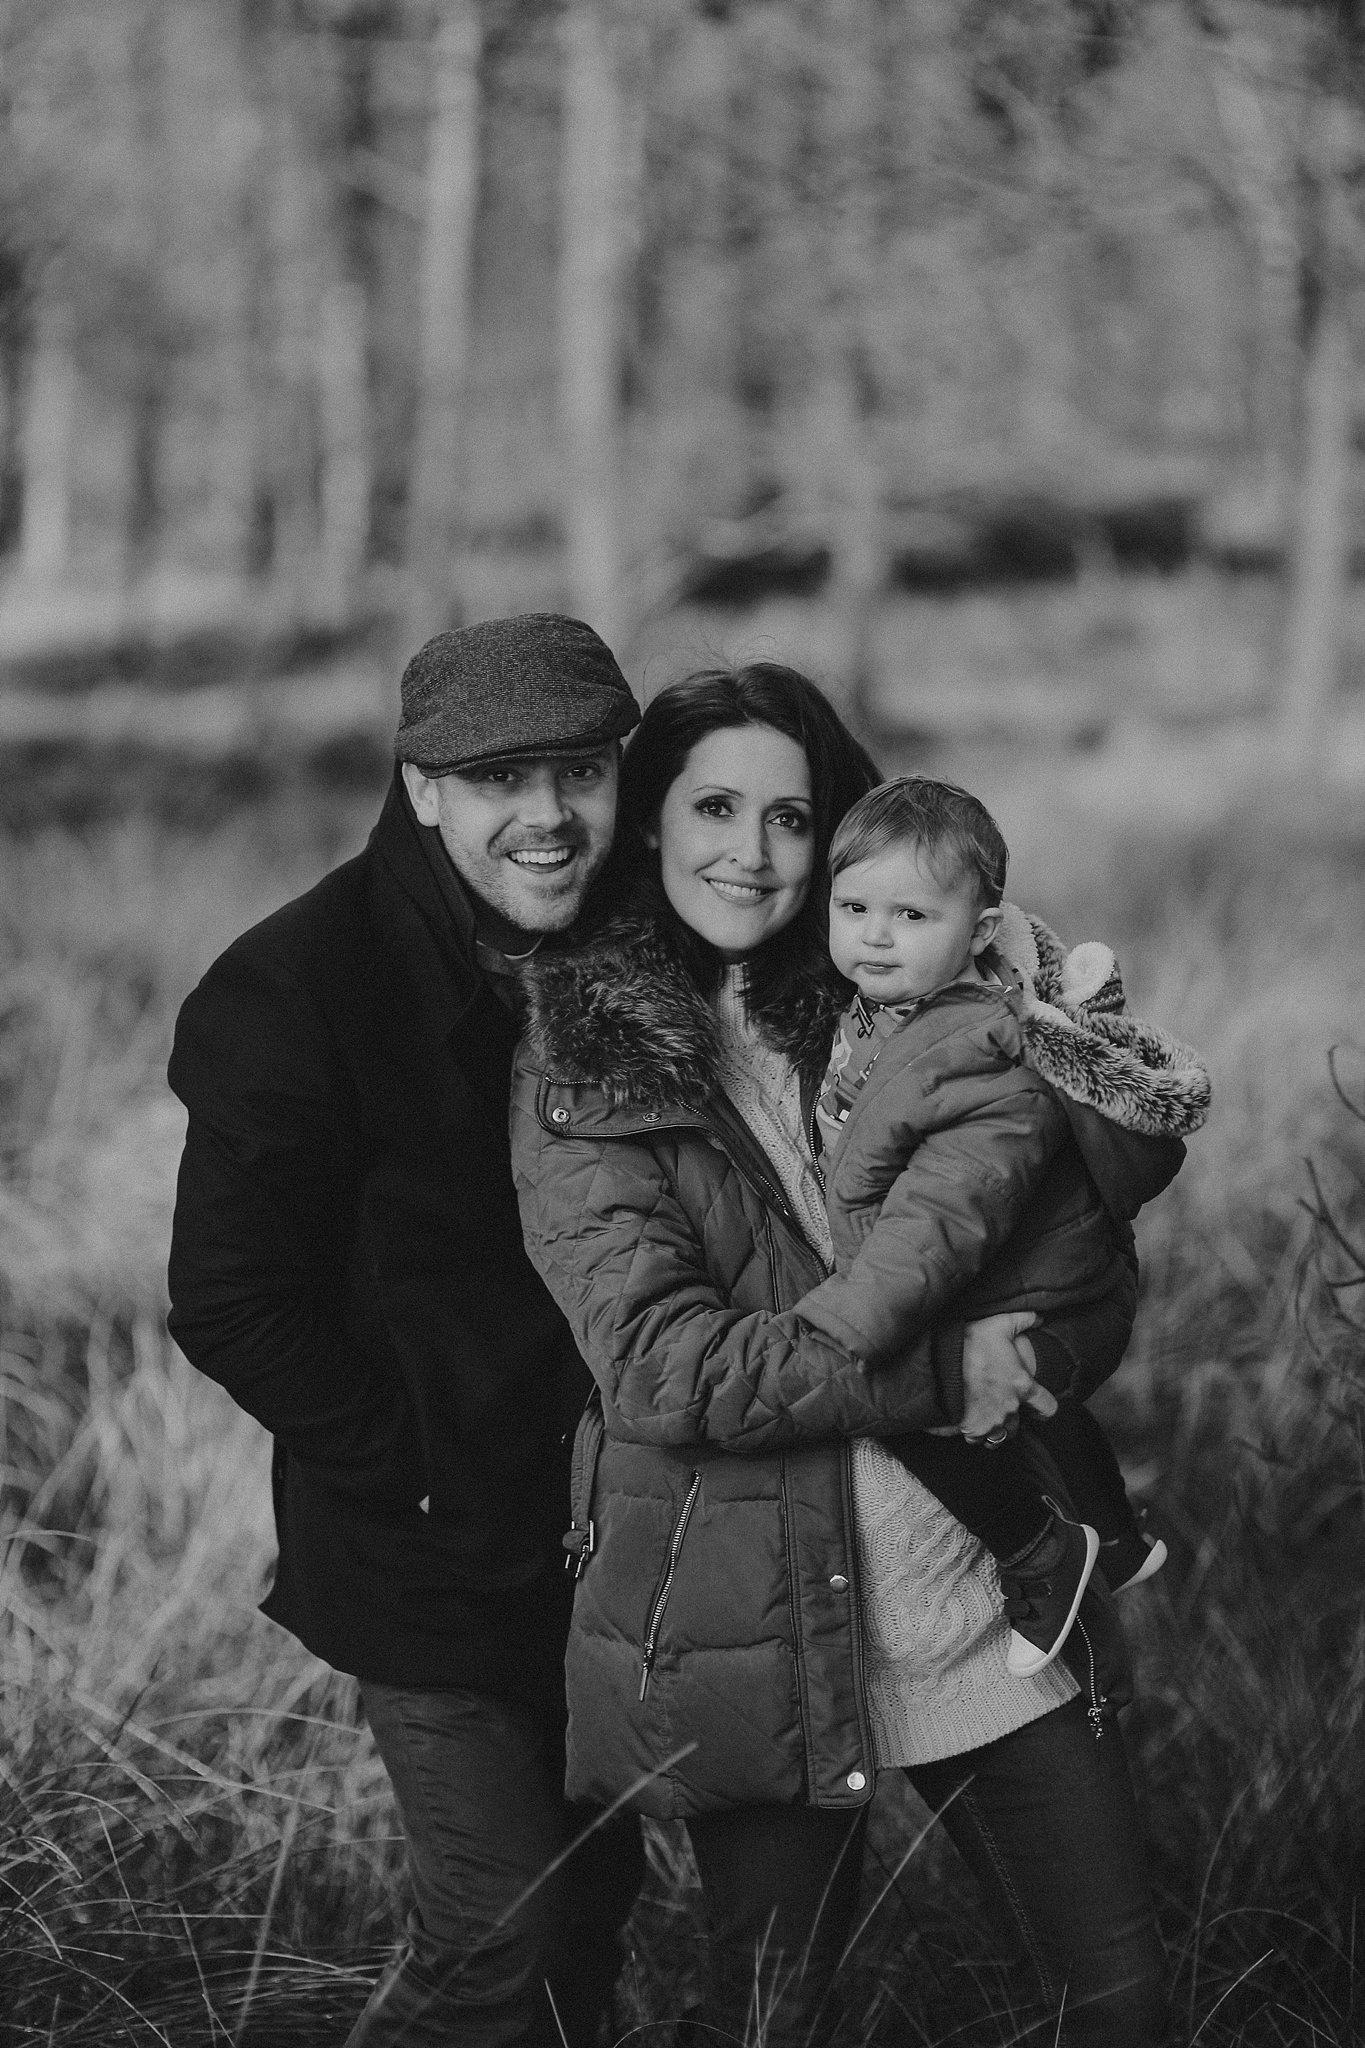 Sheffield_Family_Photography_0021.jpg